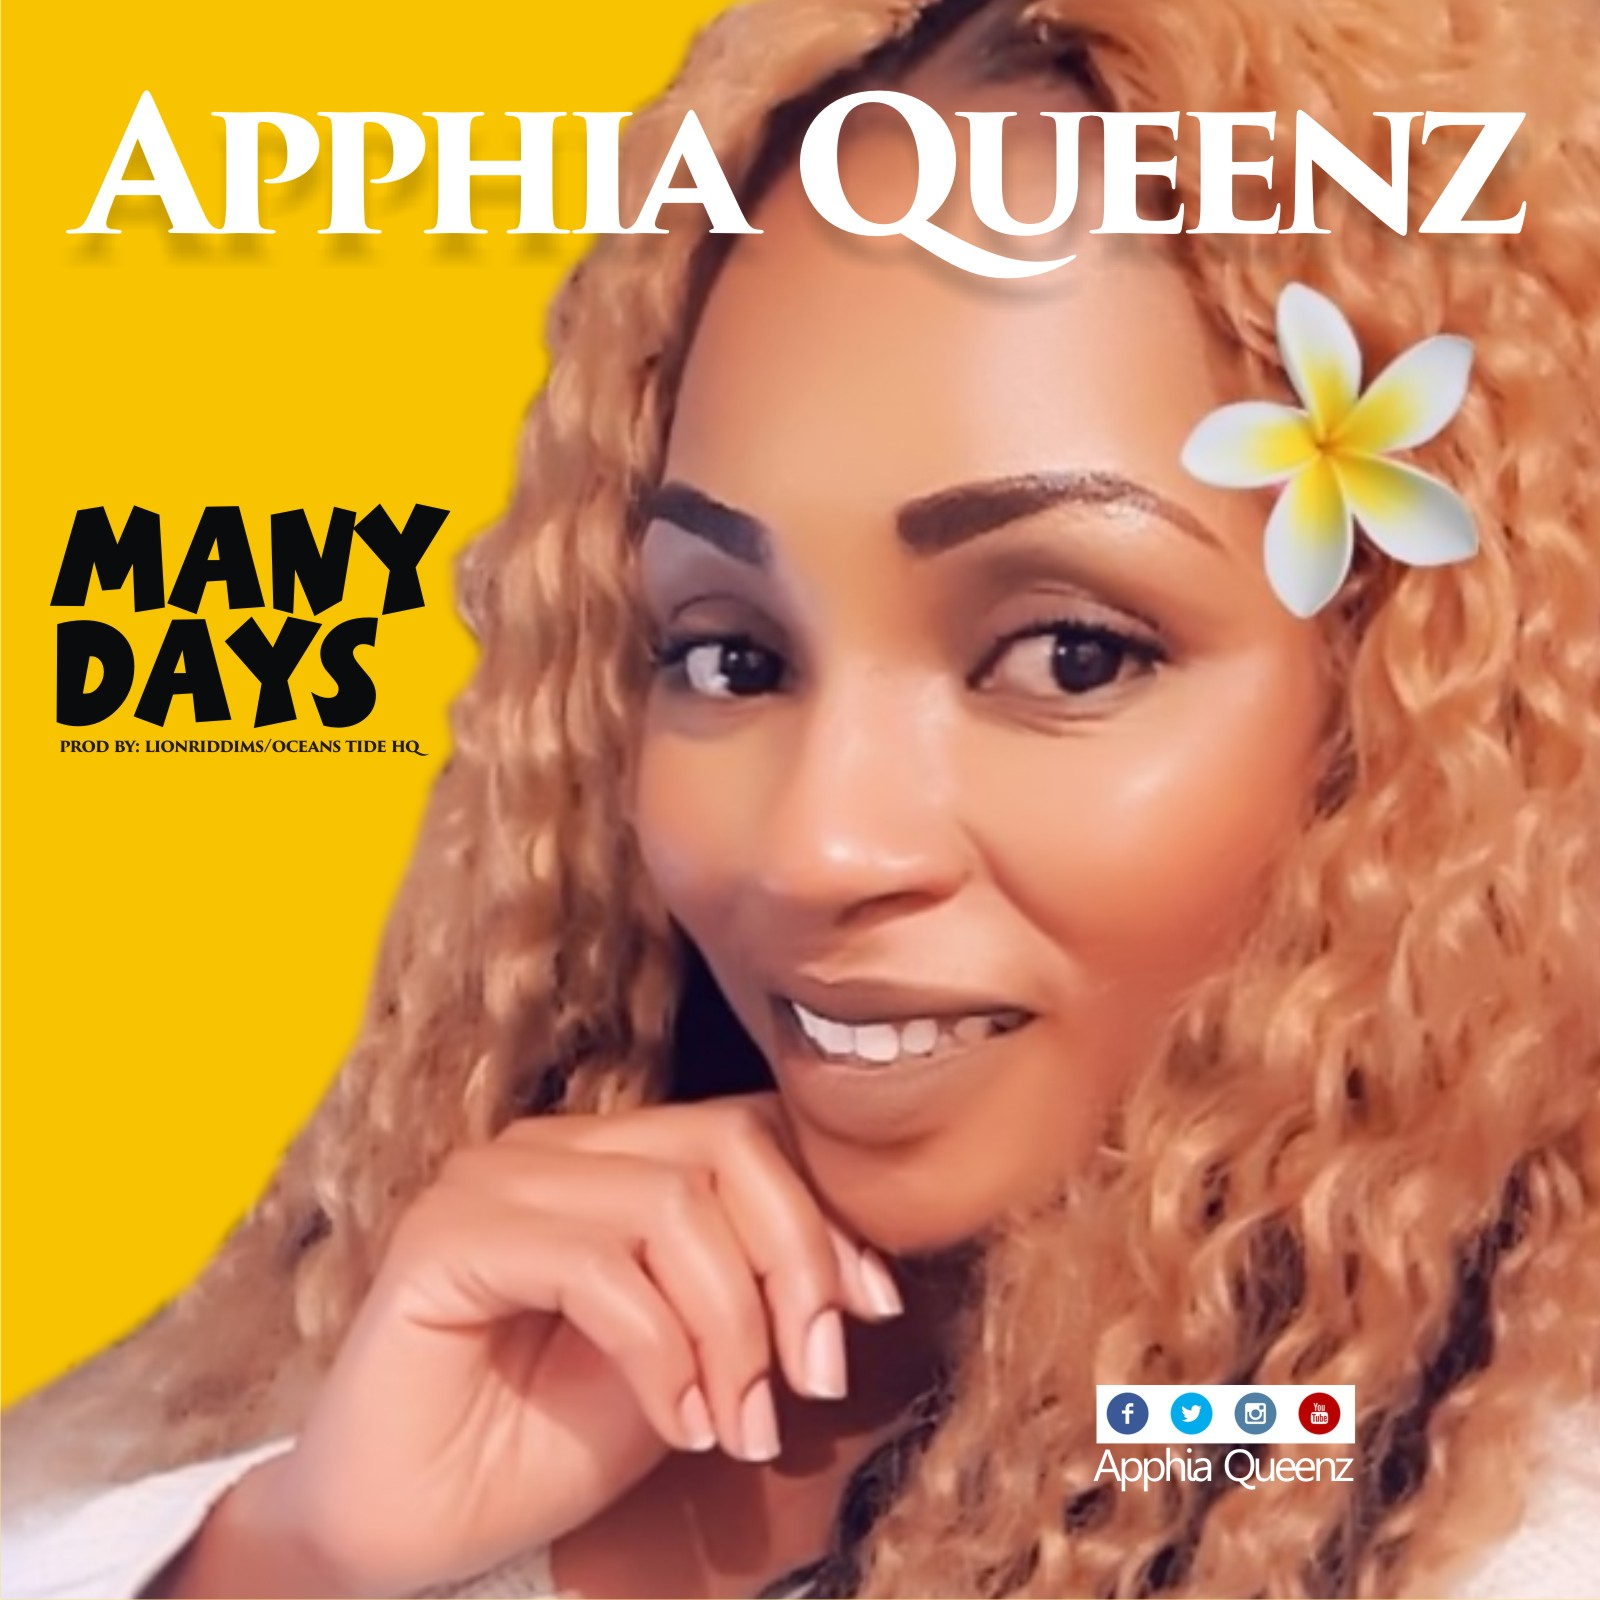 Many Days - Apphia Queenz. |@Apphia_queenz